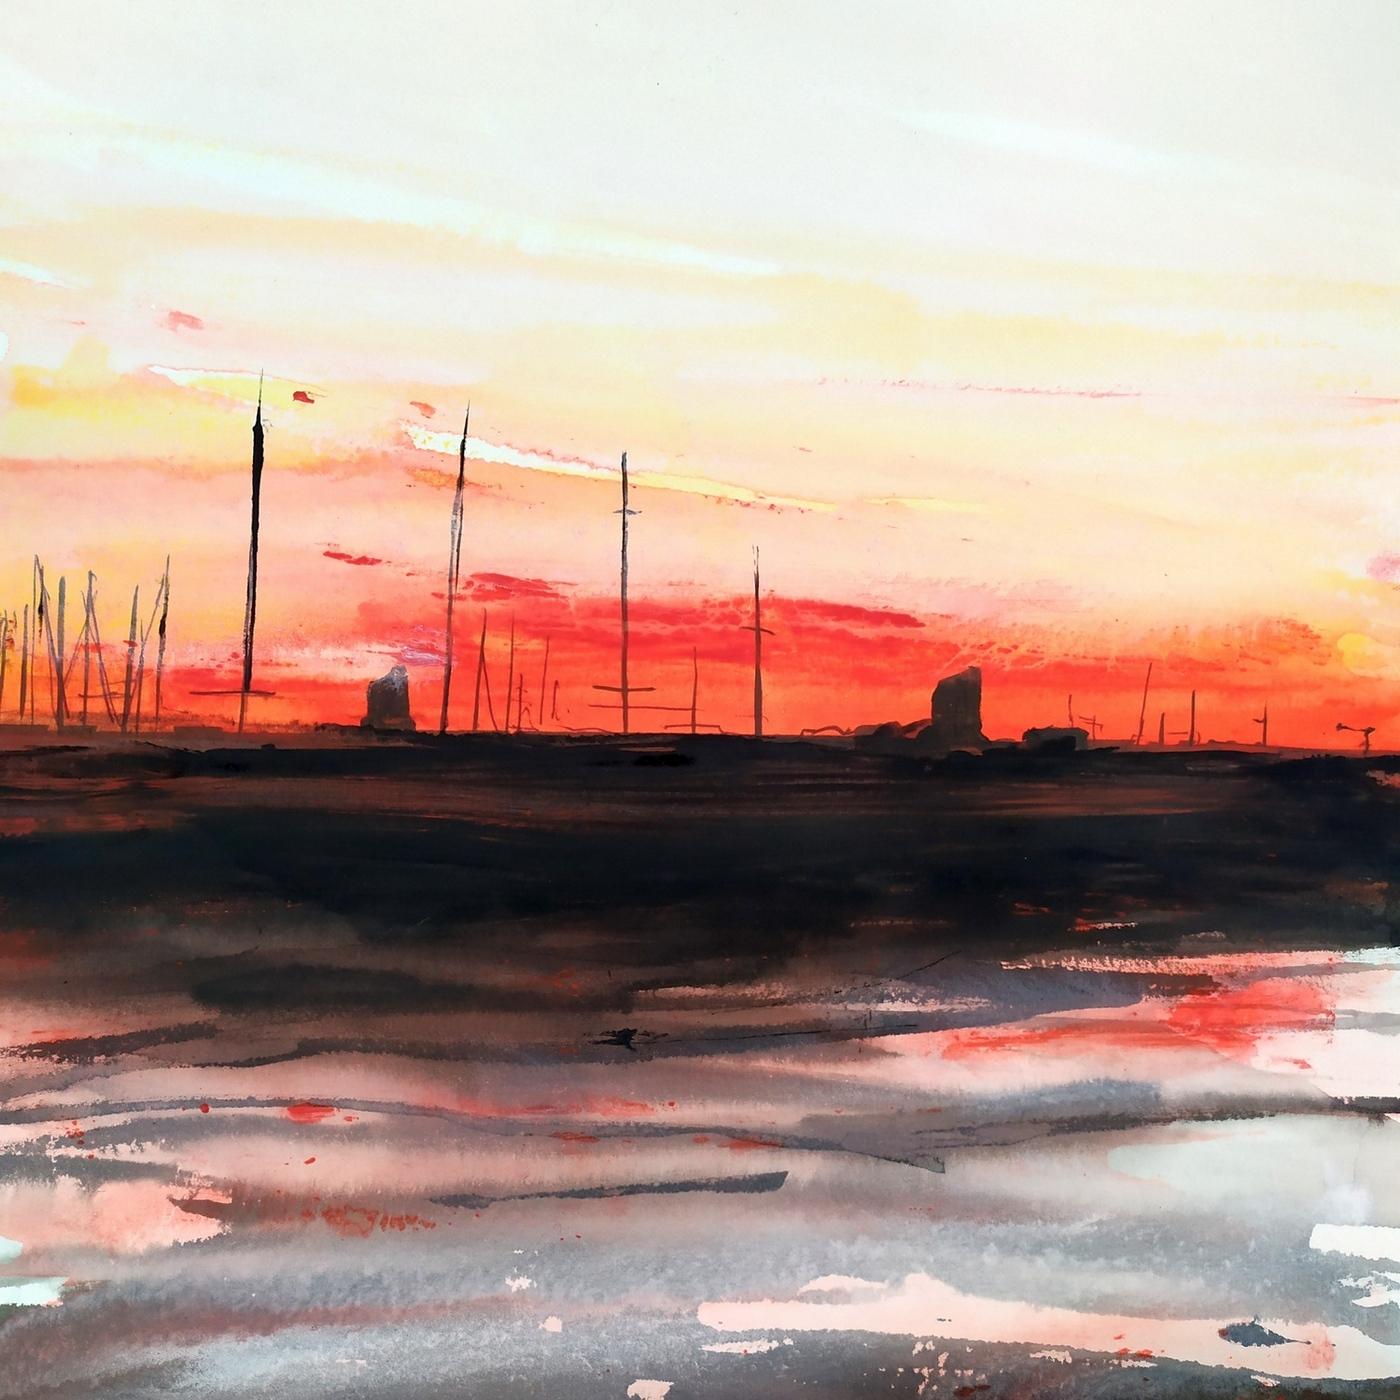 2020 Darsena al tramonto 30x30cm tecnica mista su carta